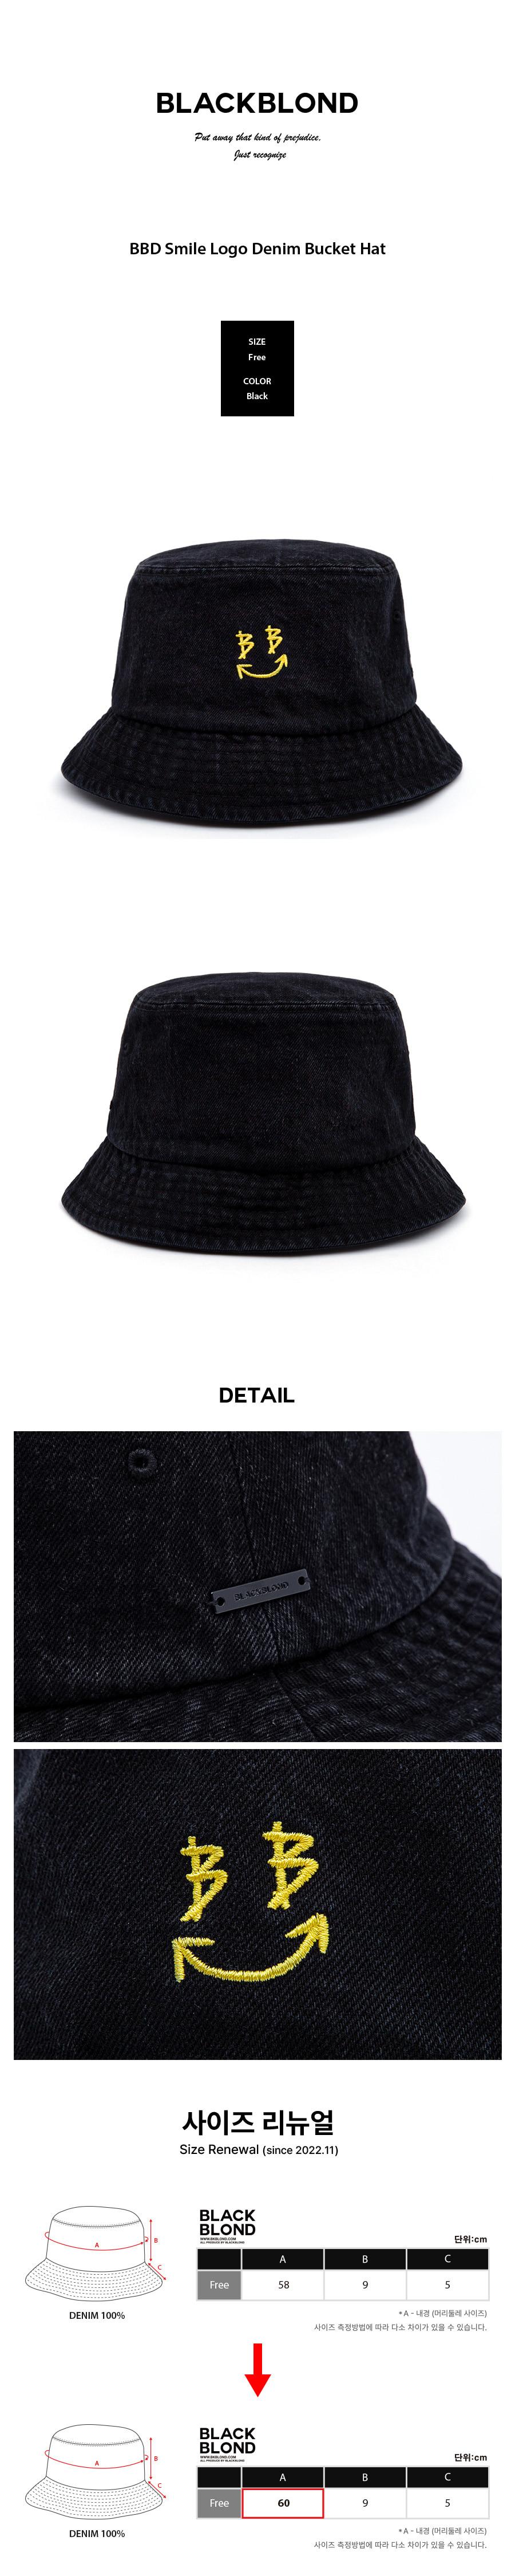 BBD-Smile-Logo-Denim-Bucket-Hat-%28Black%29.jpg